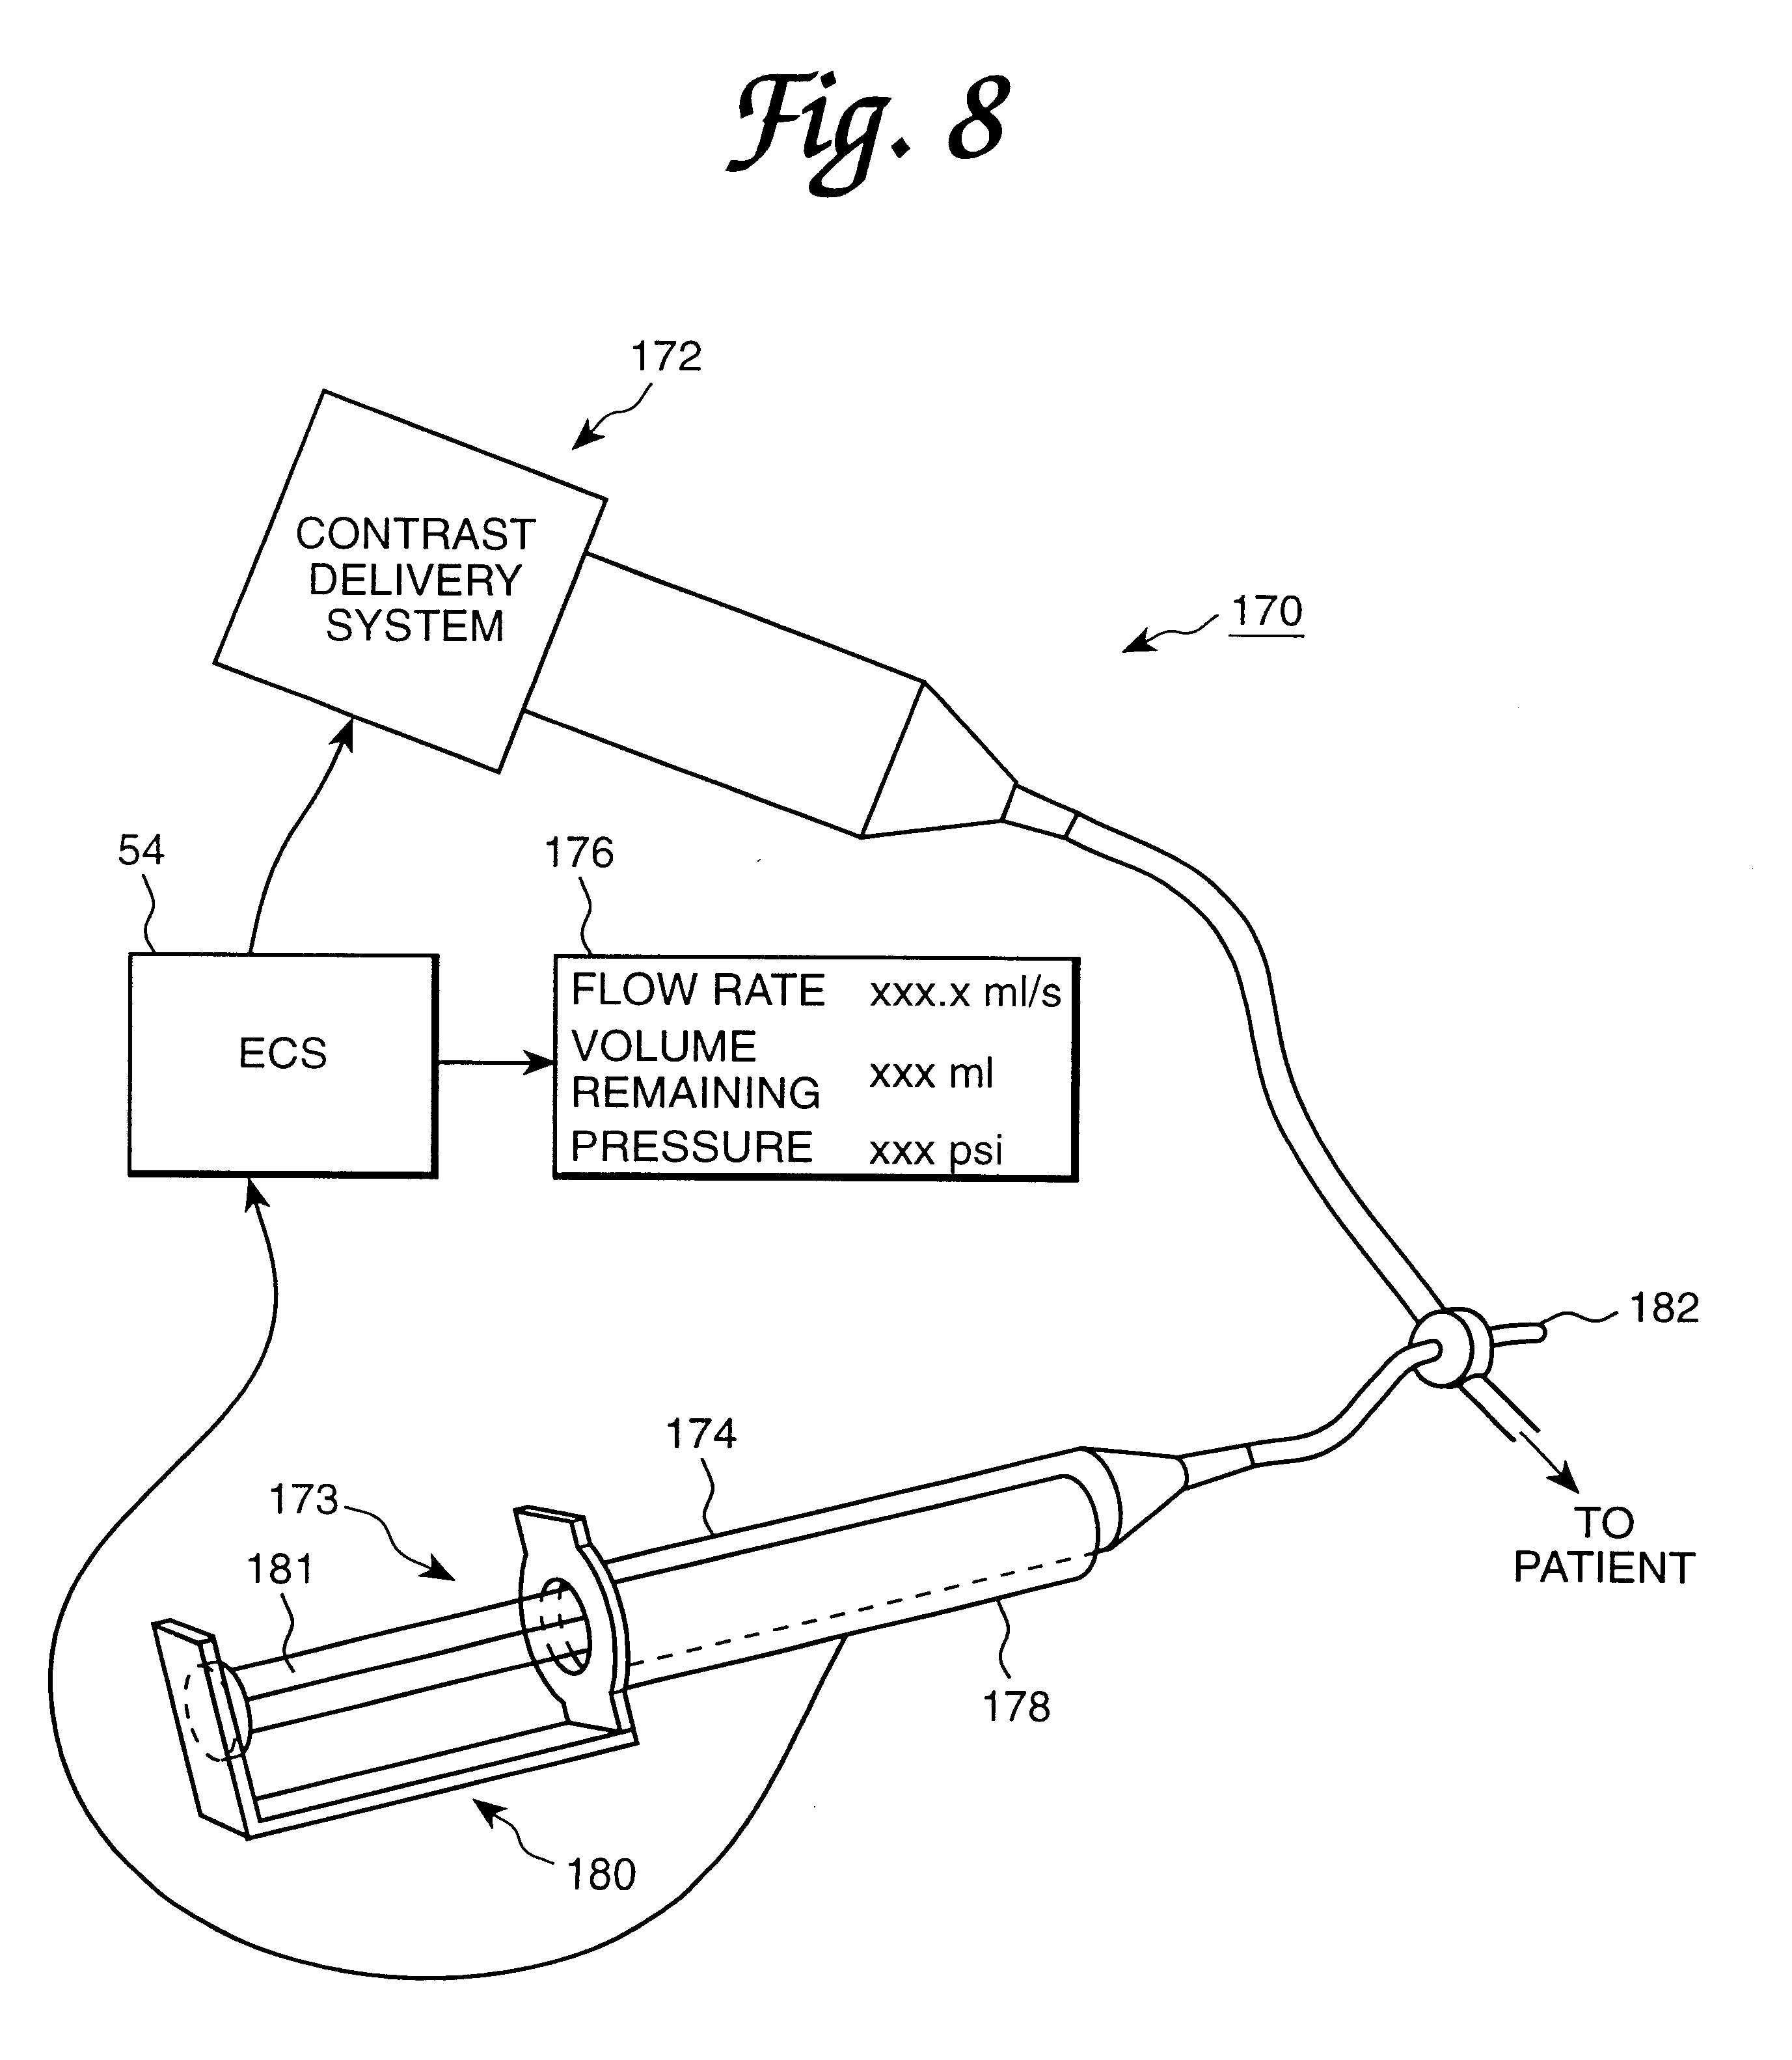 pulse oximeter readings chart wiring diagram database  patent us 6 385 483 b1 pulse oximeter readings graph pulse oximeter readings chart